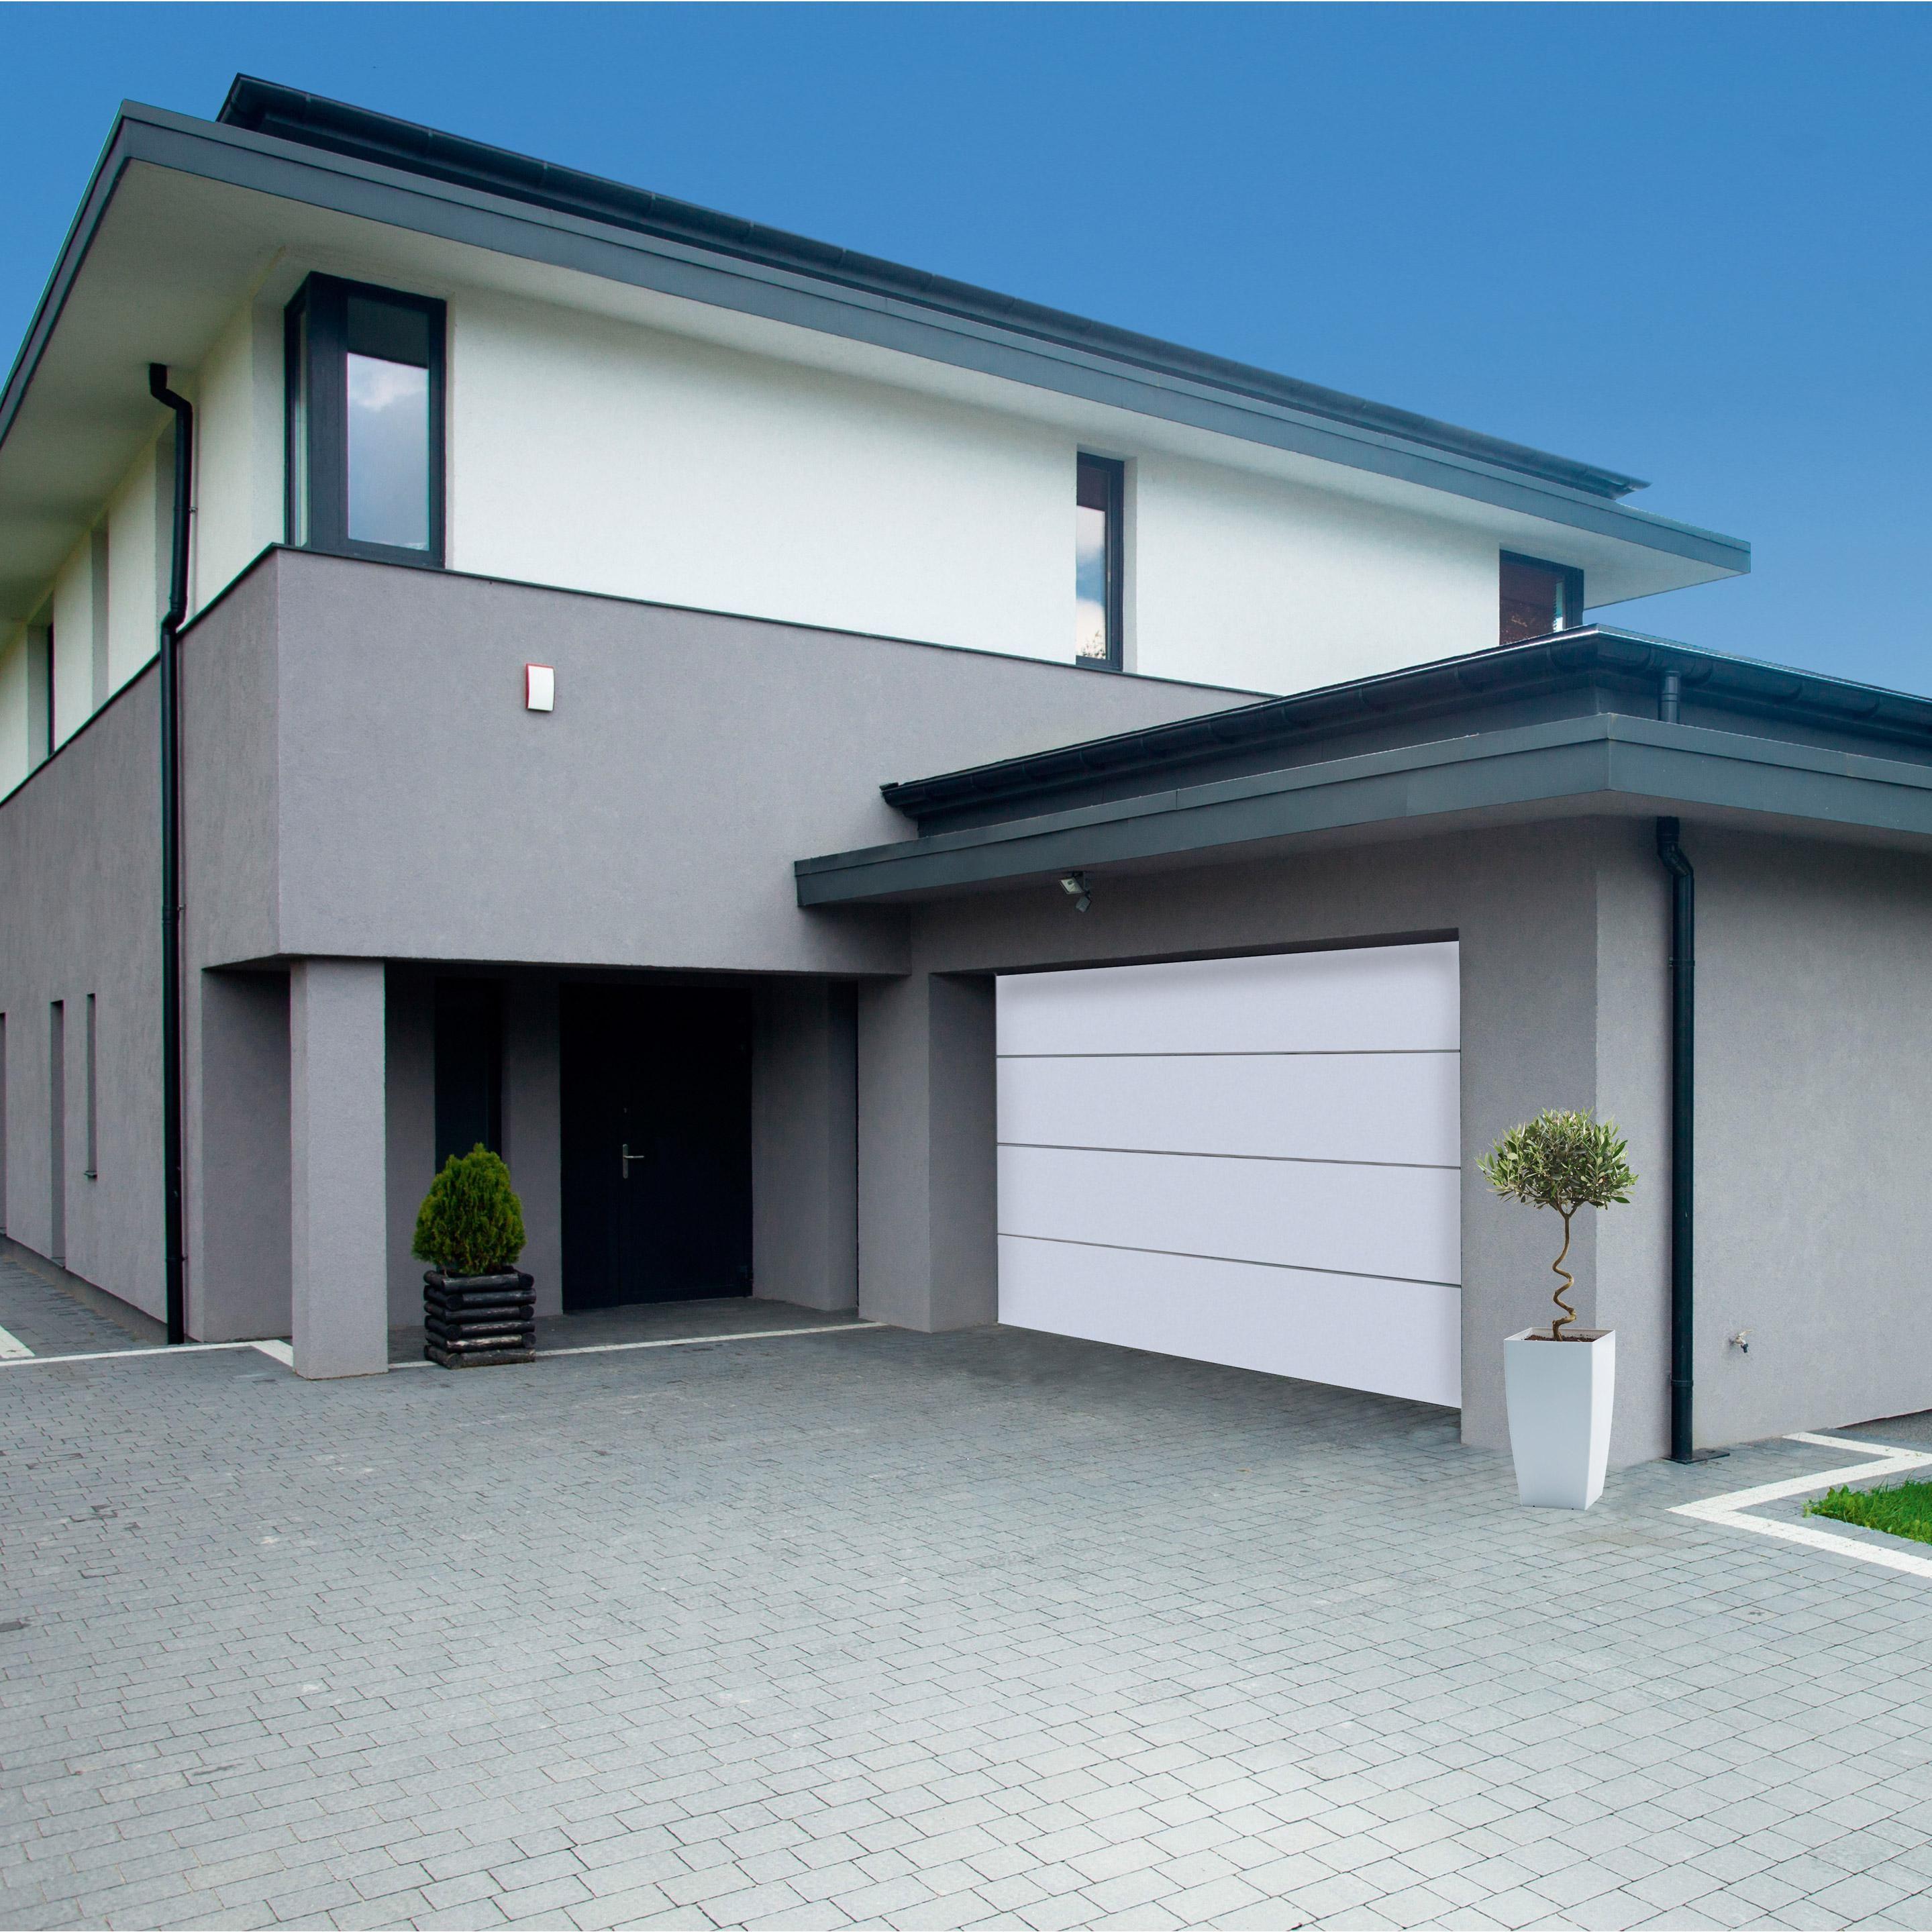 Porte De Garage Sectionnelle Motorisee Artens Premium H 200 X L 300 Cm Porte De Garage Sectionnelle Porte Garage Et Garage